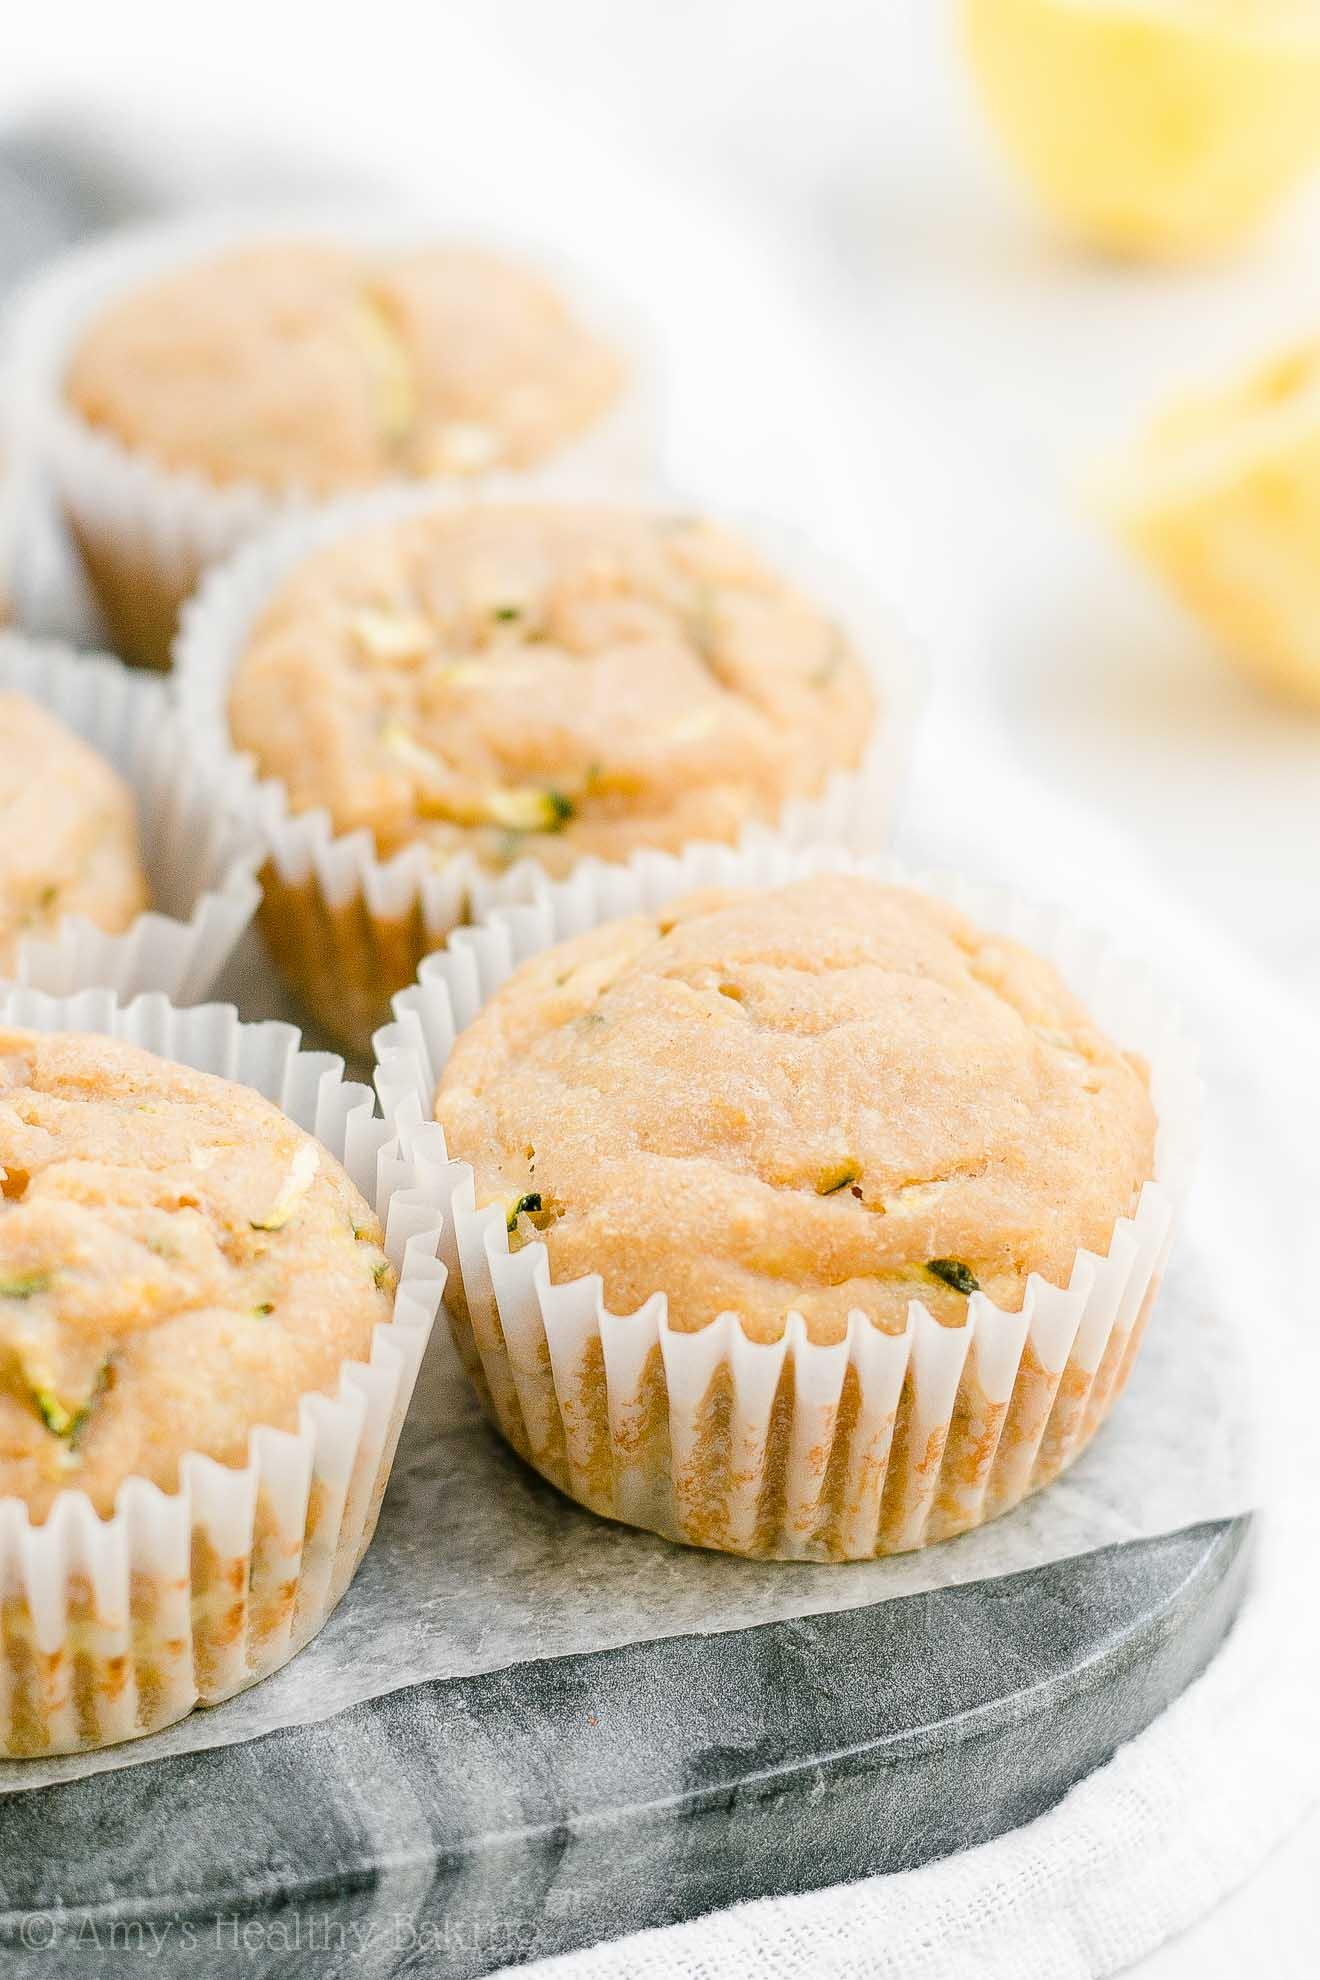 Healthy Gluten Free Sugar Free Lemon Zucchini Muffins